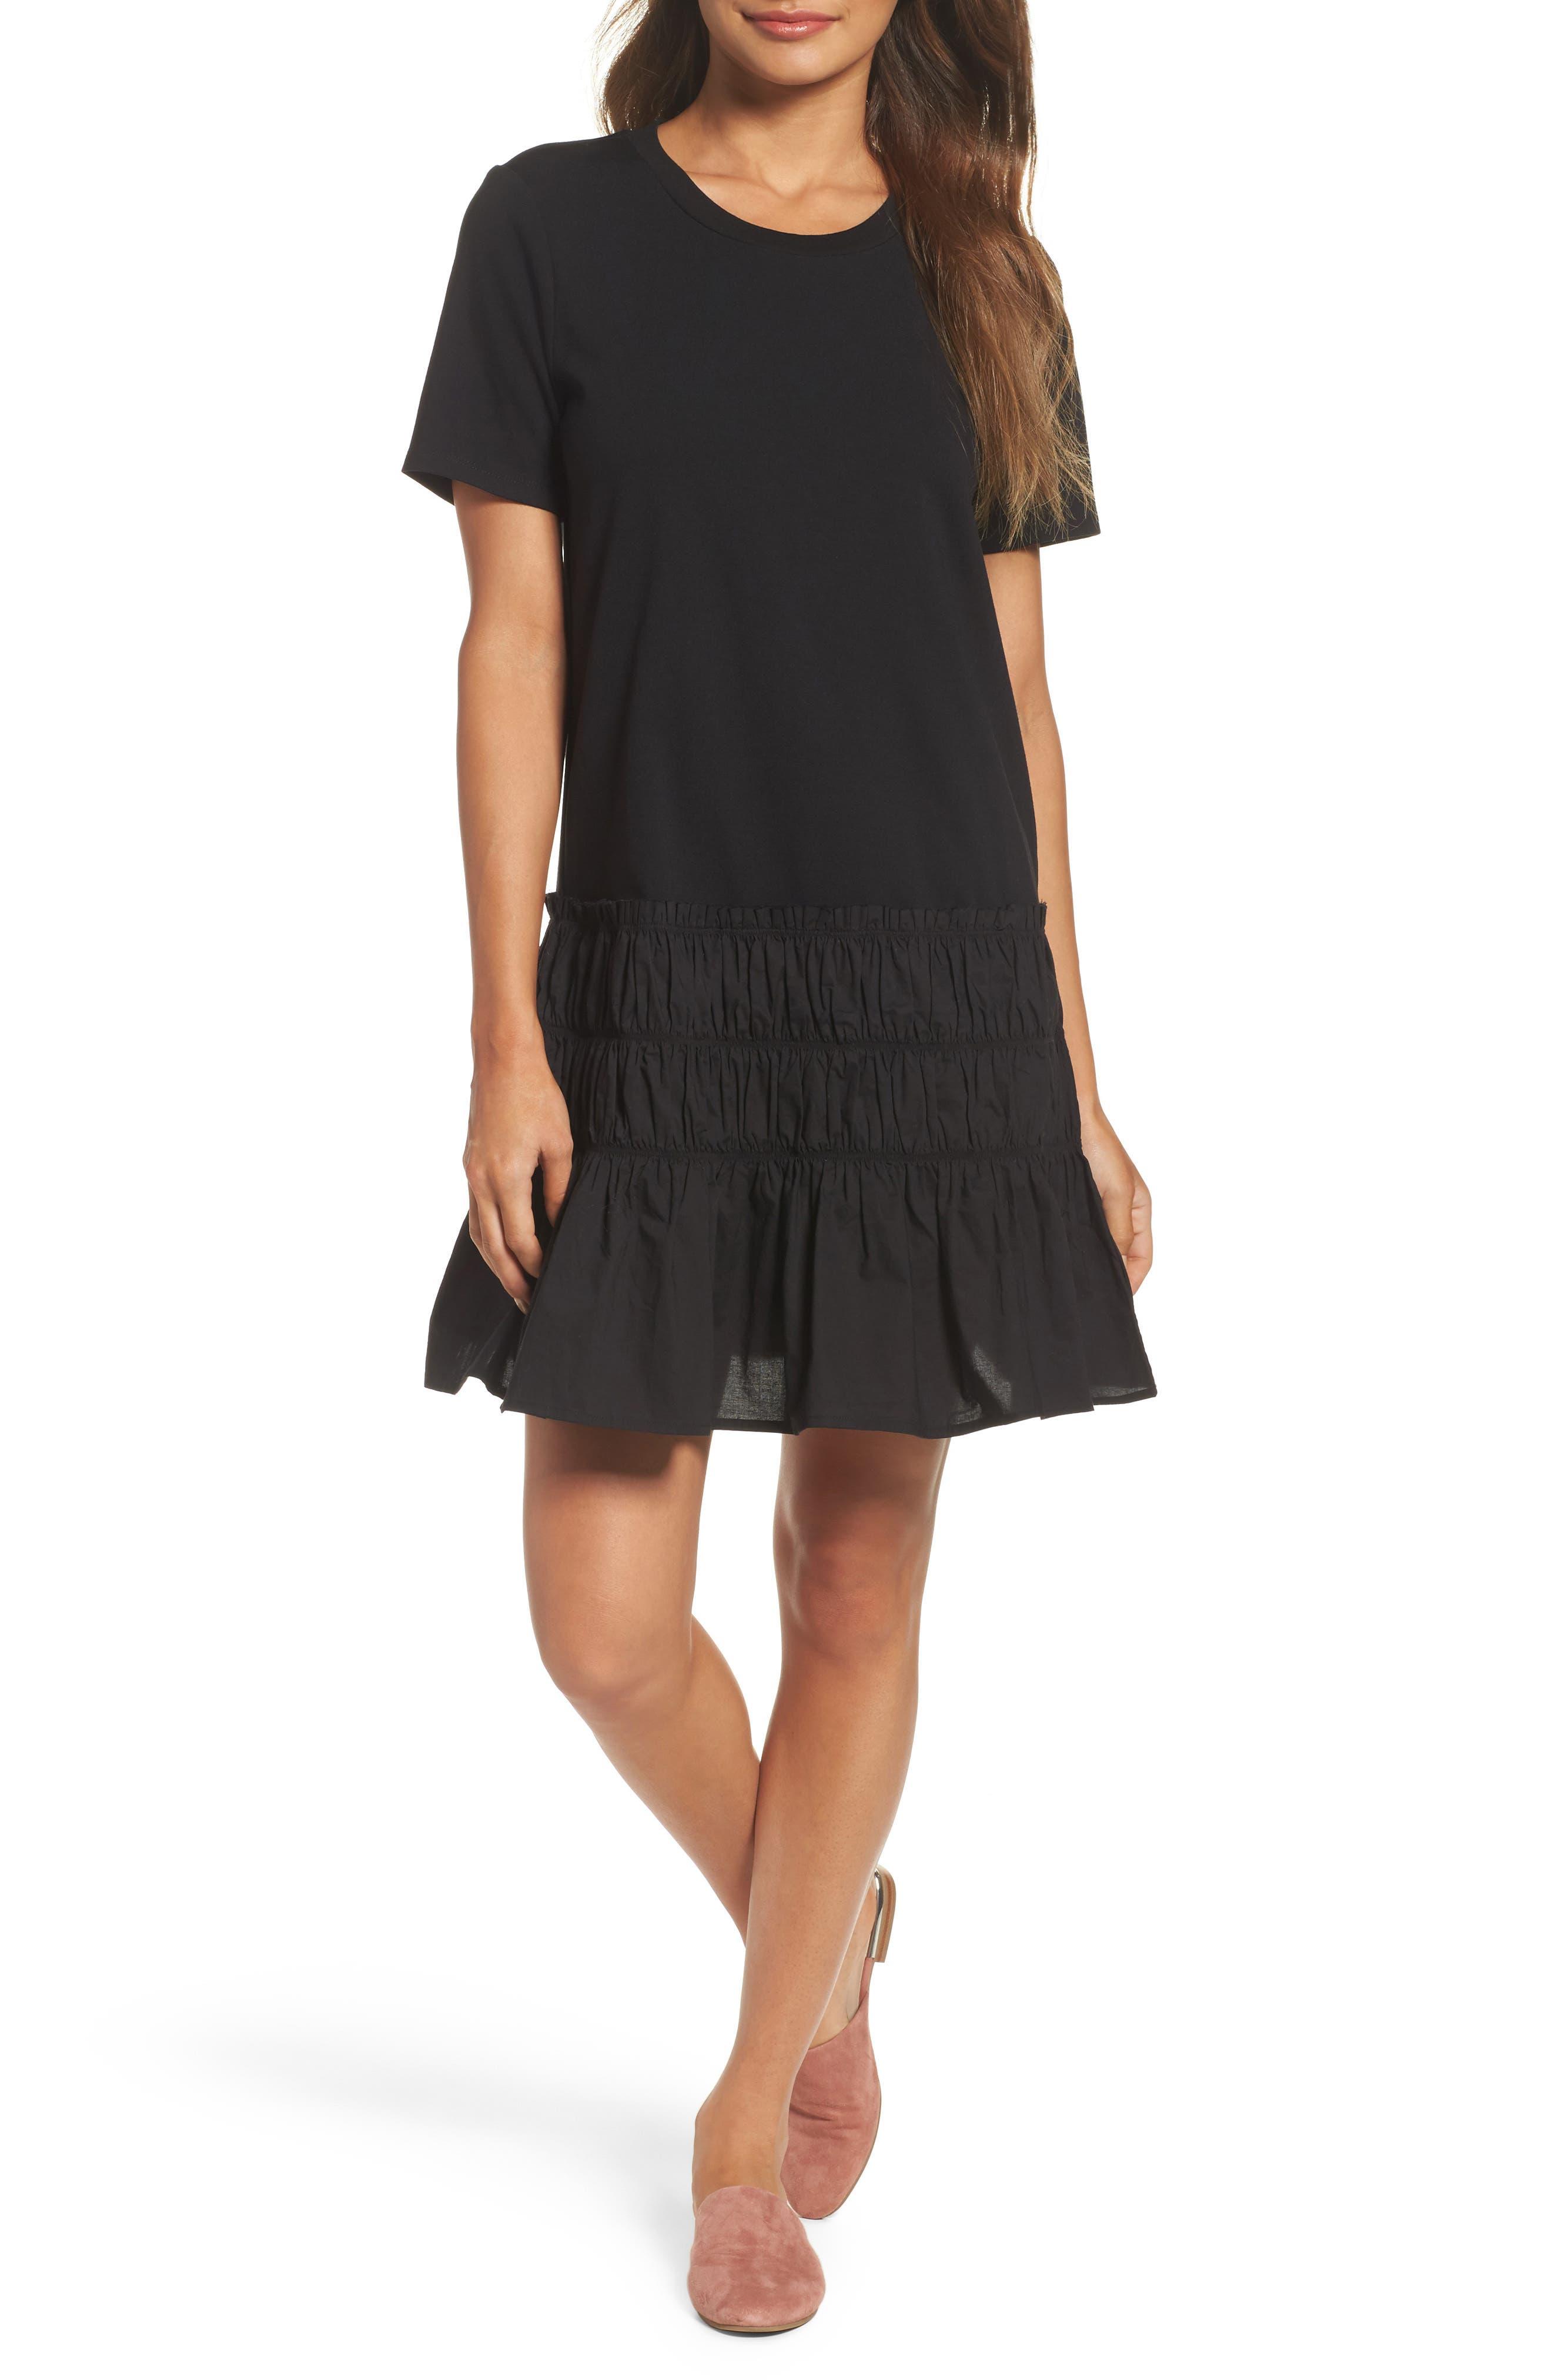 Alternate Image 1 Selected - Chelsea28 Smocked T-Shirt Dress